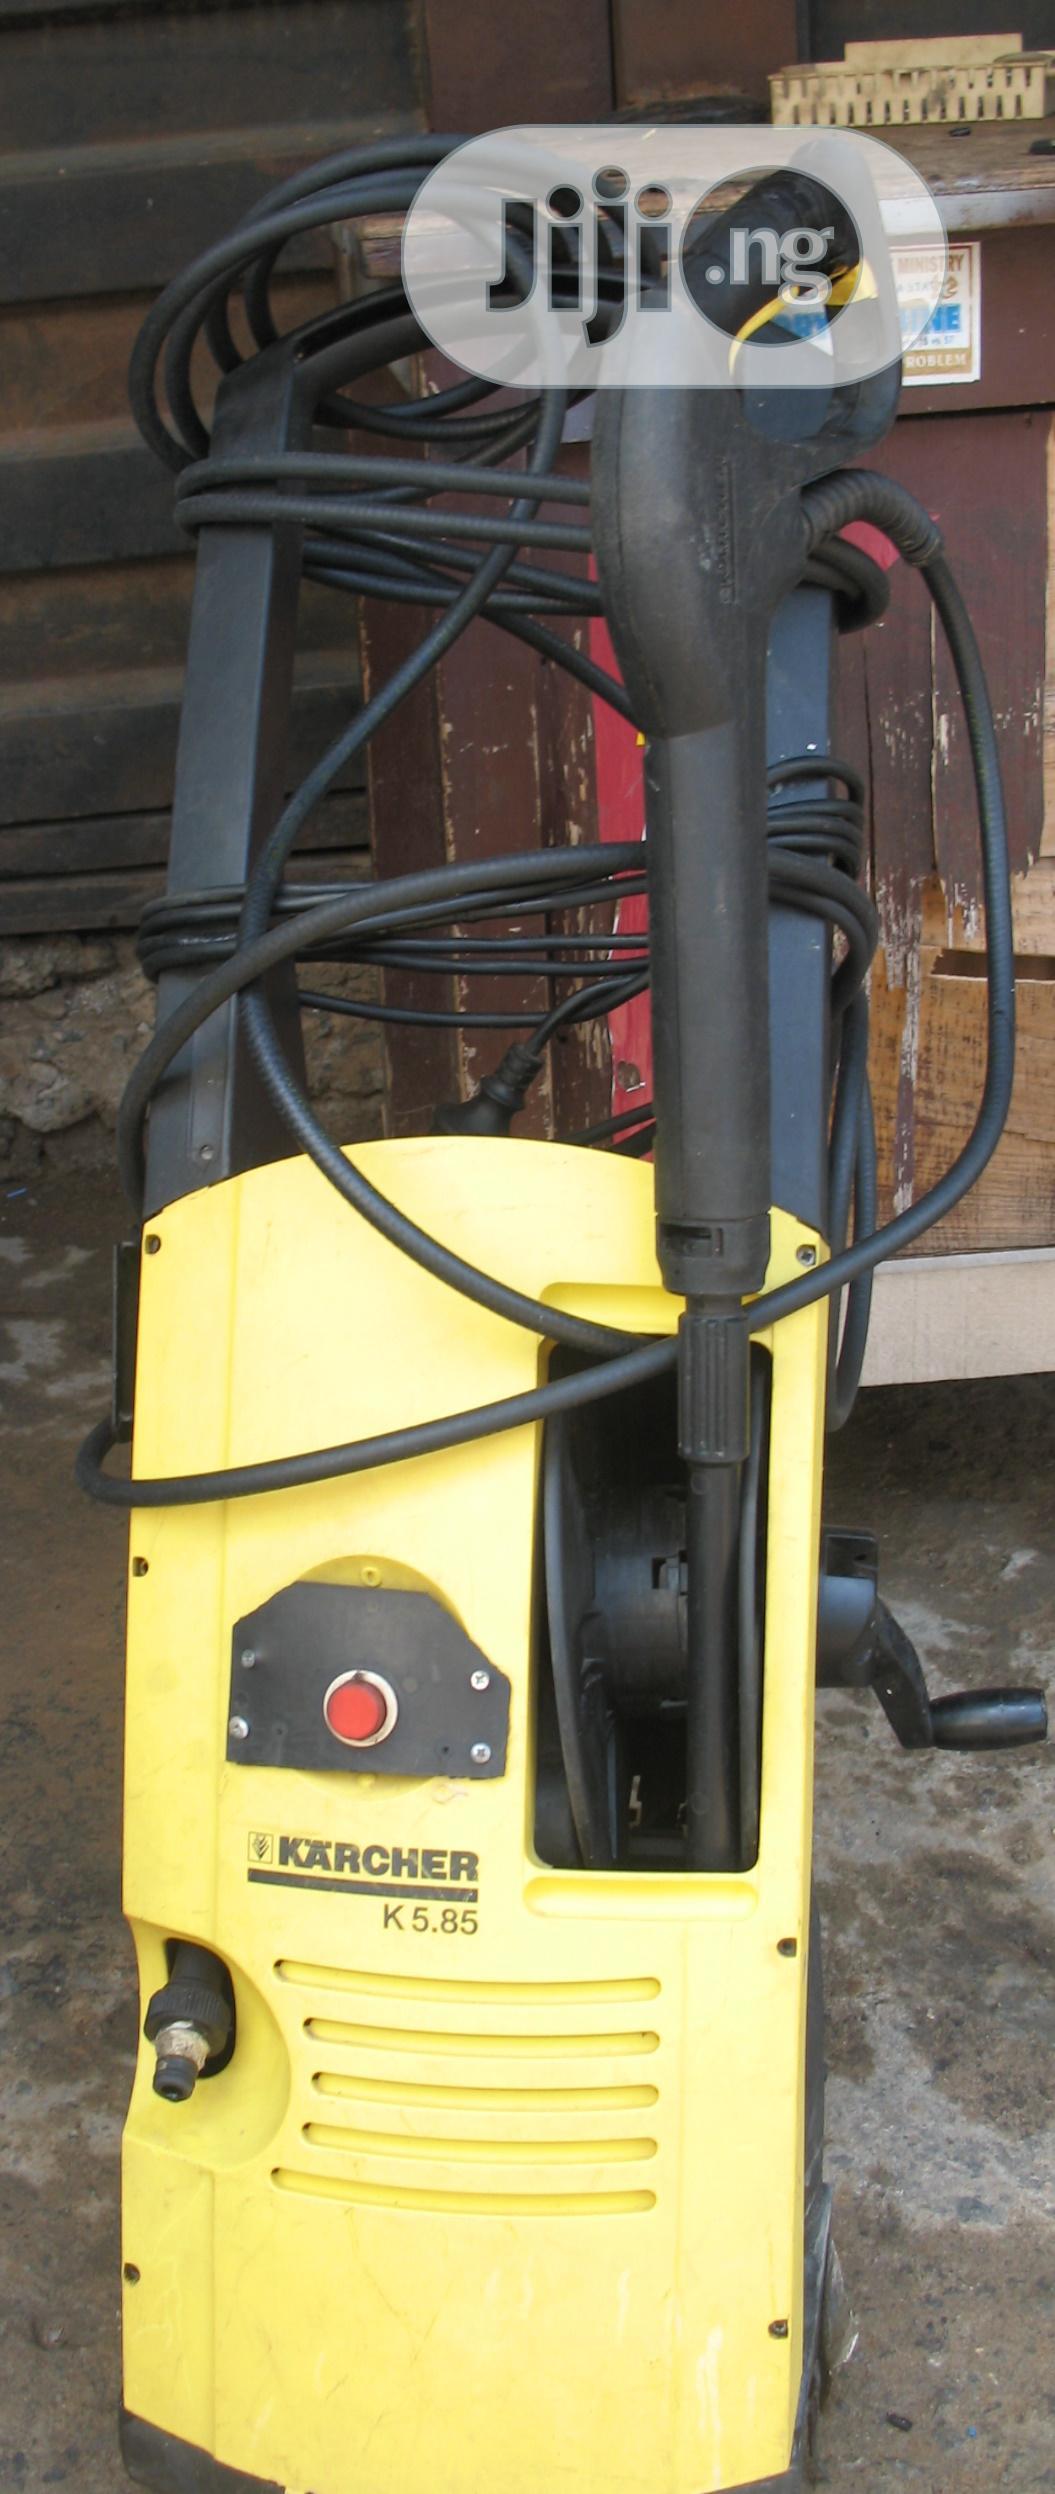 Karcher K5.85M Versatile High Pressure Washer For Private & Commercial